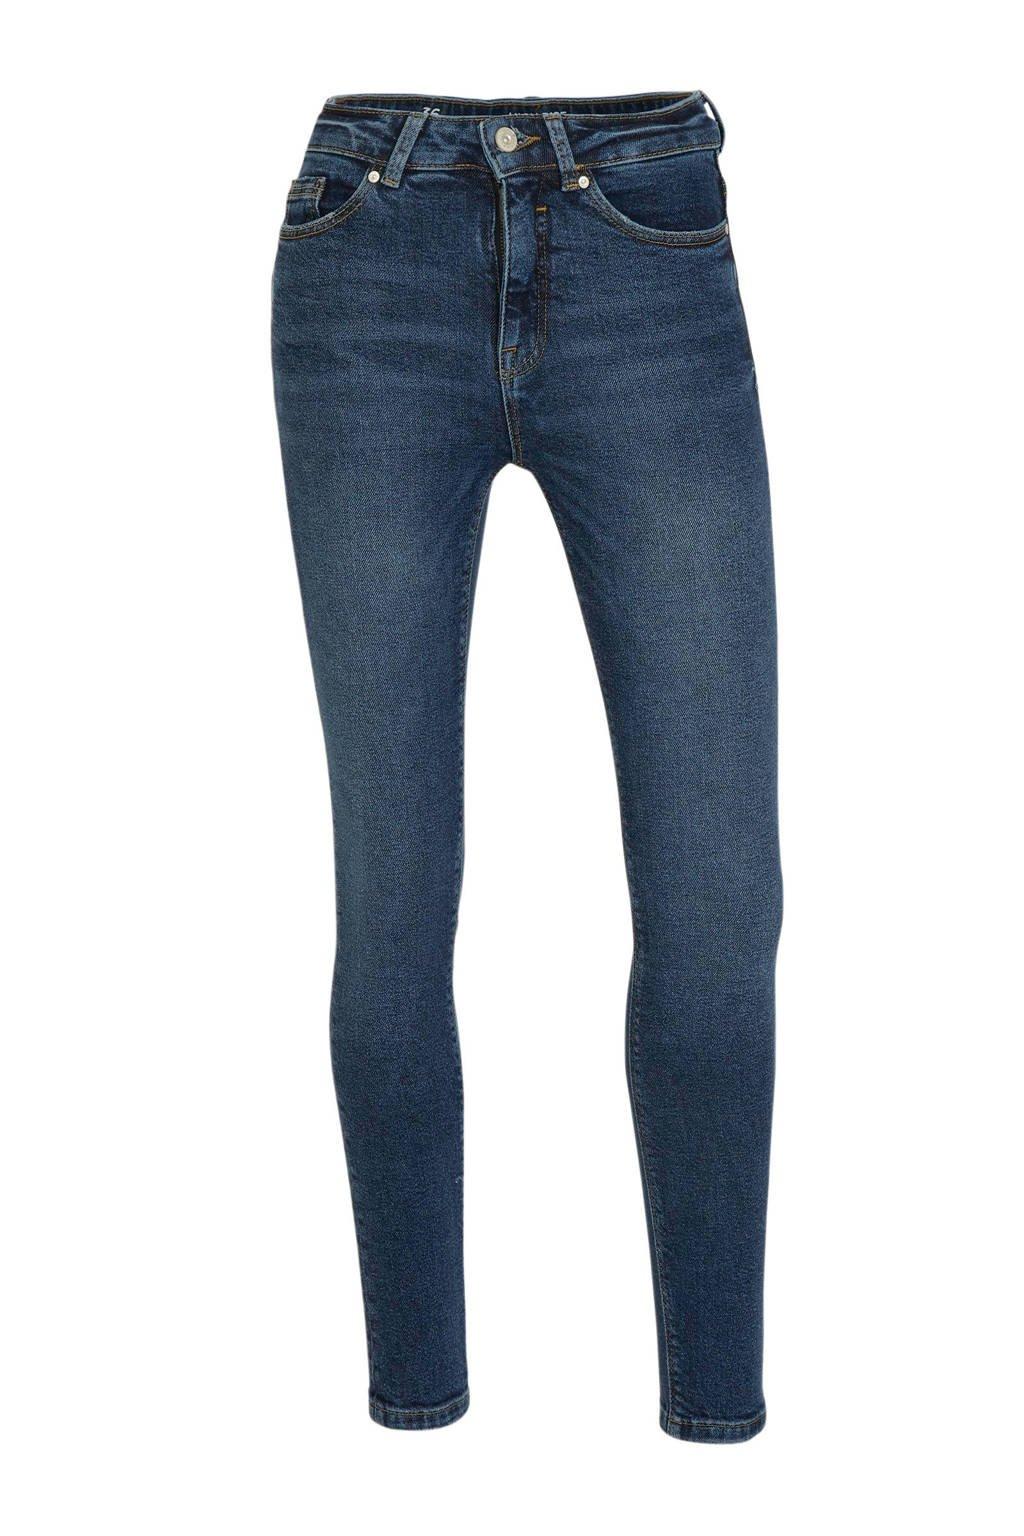 C&A Clockhouse high waist skinny jeans donkerblauw, Donkerblauw